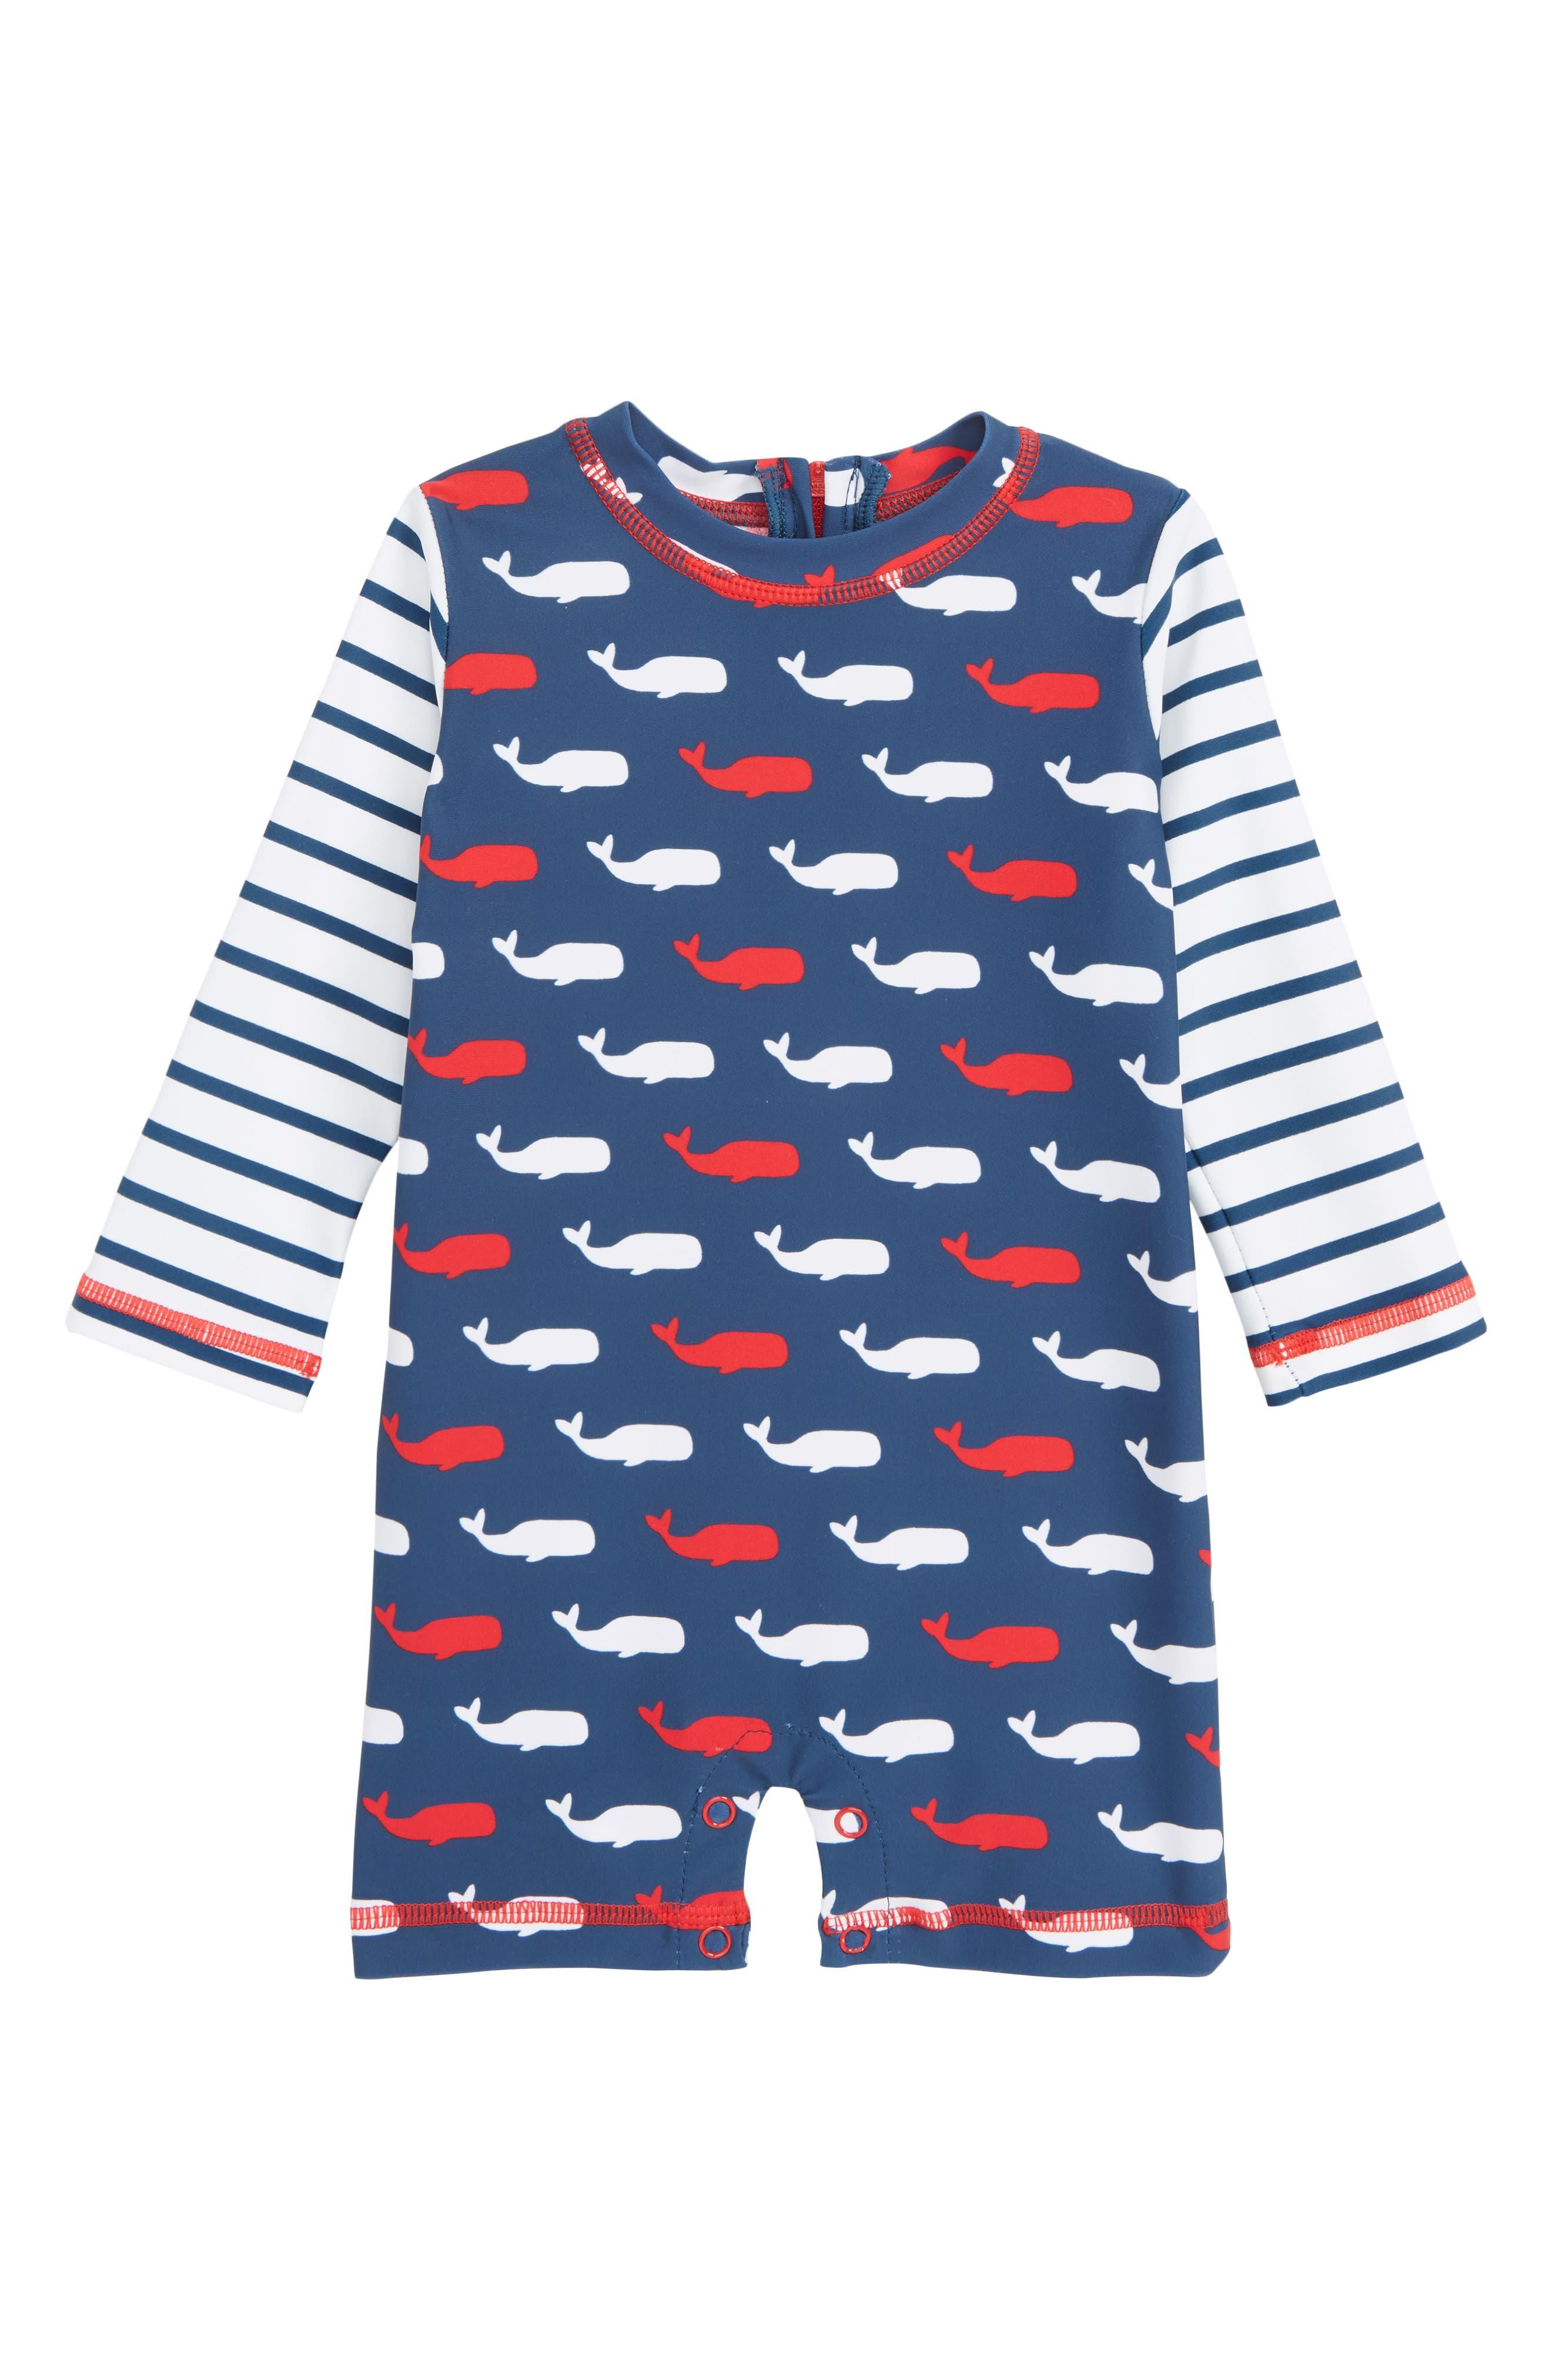 HATLEY Whale Pod One-Piece Rashguard Swimsuit, Main, color, 400